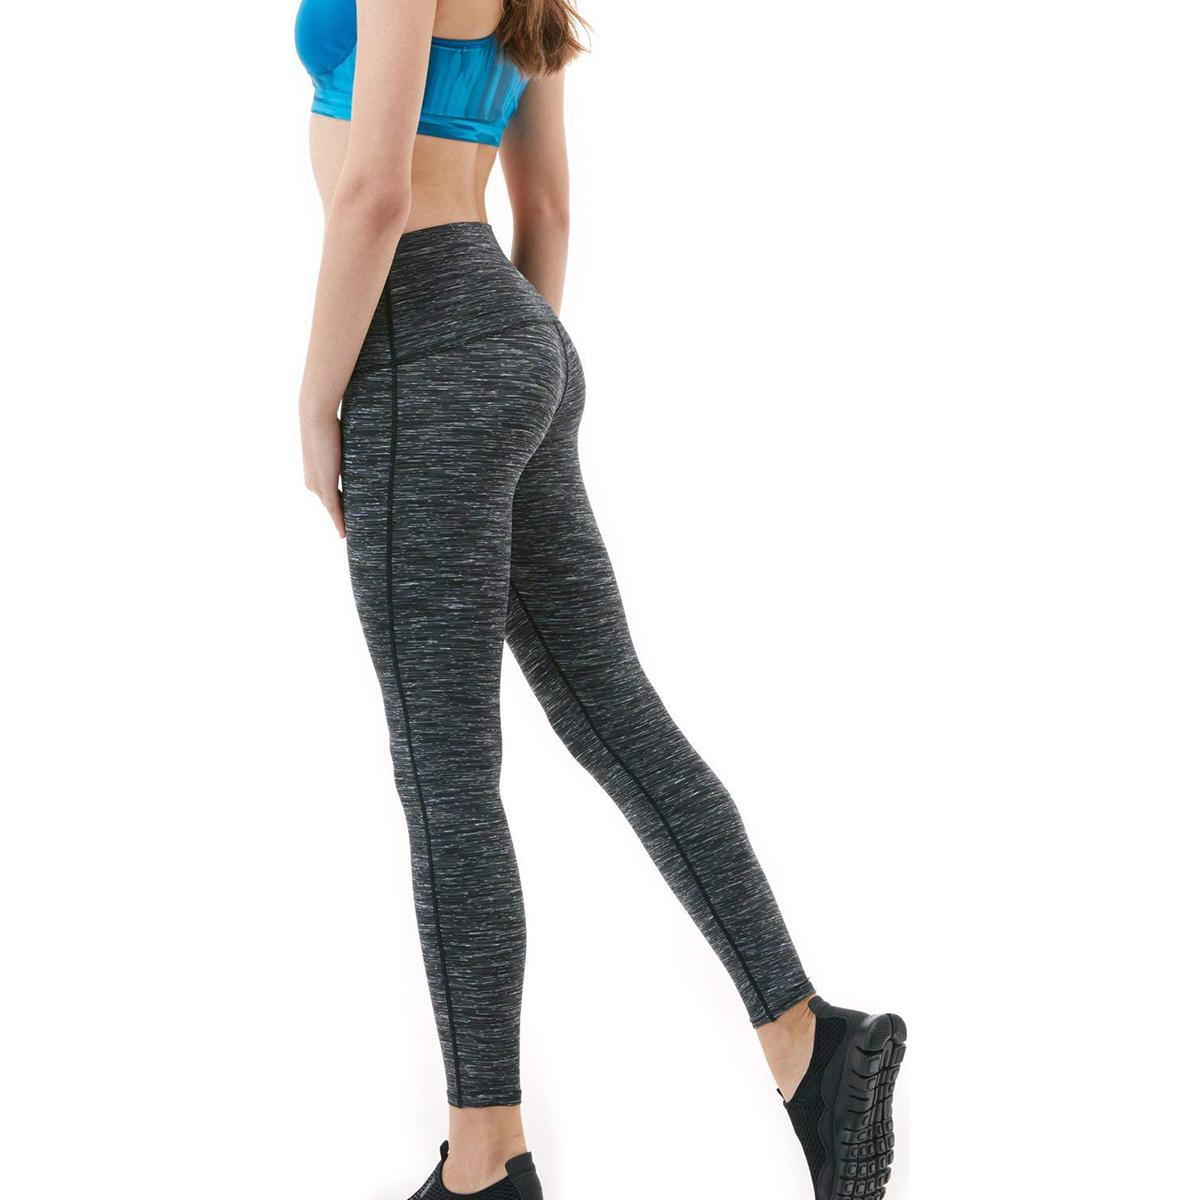 thumbnail 33 - TSLA Tesla FYP52 Women's High-Waisted Ultra-Stretch Tummy Control Yoga Pants